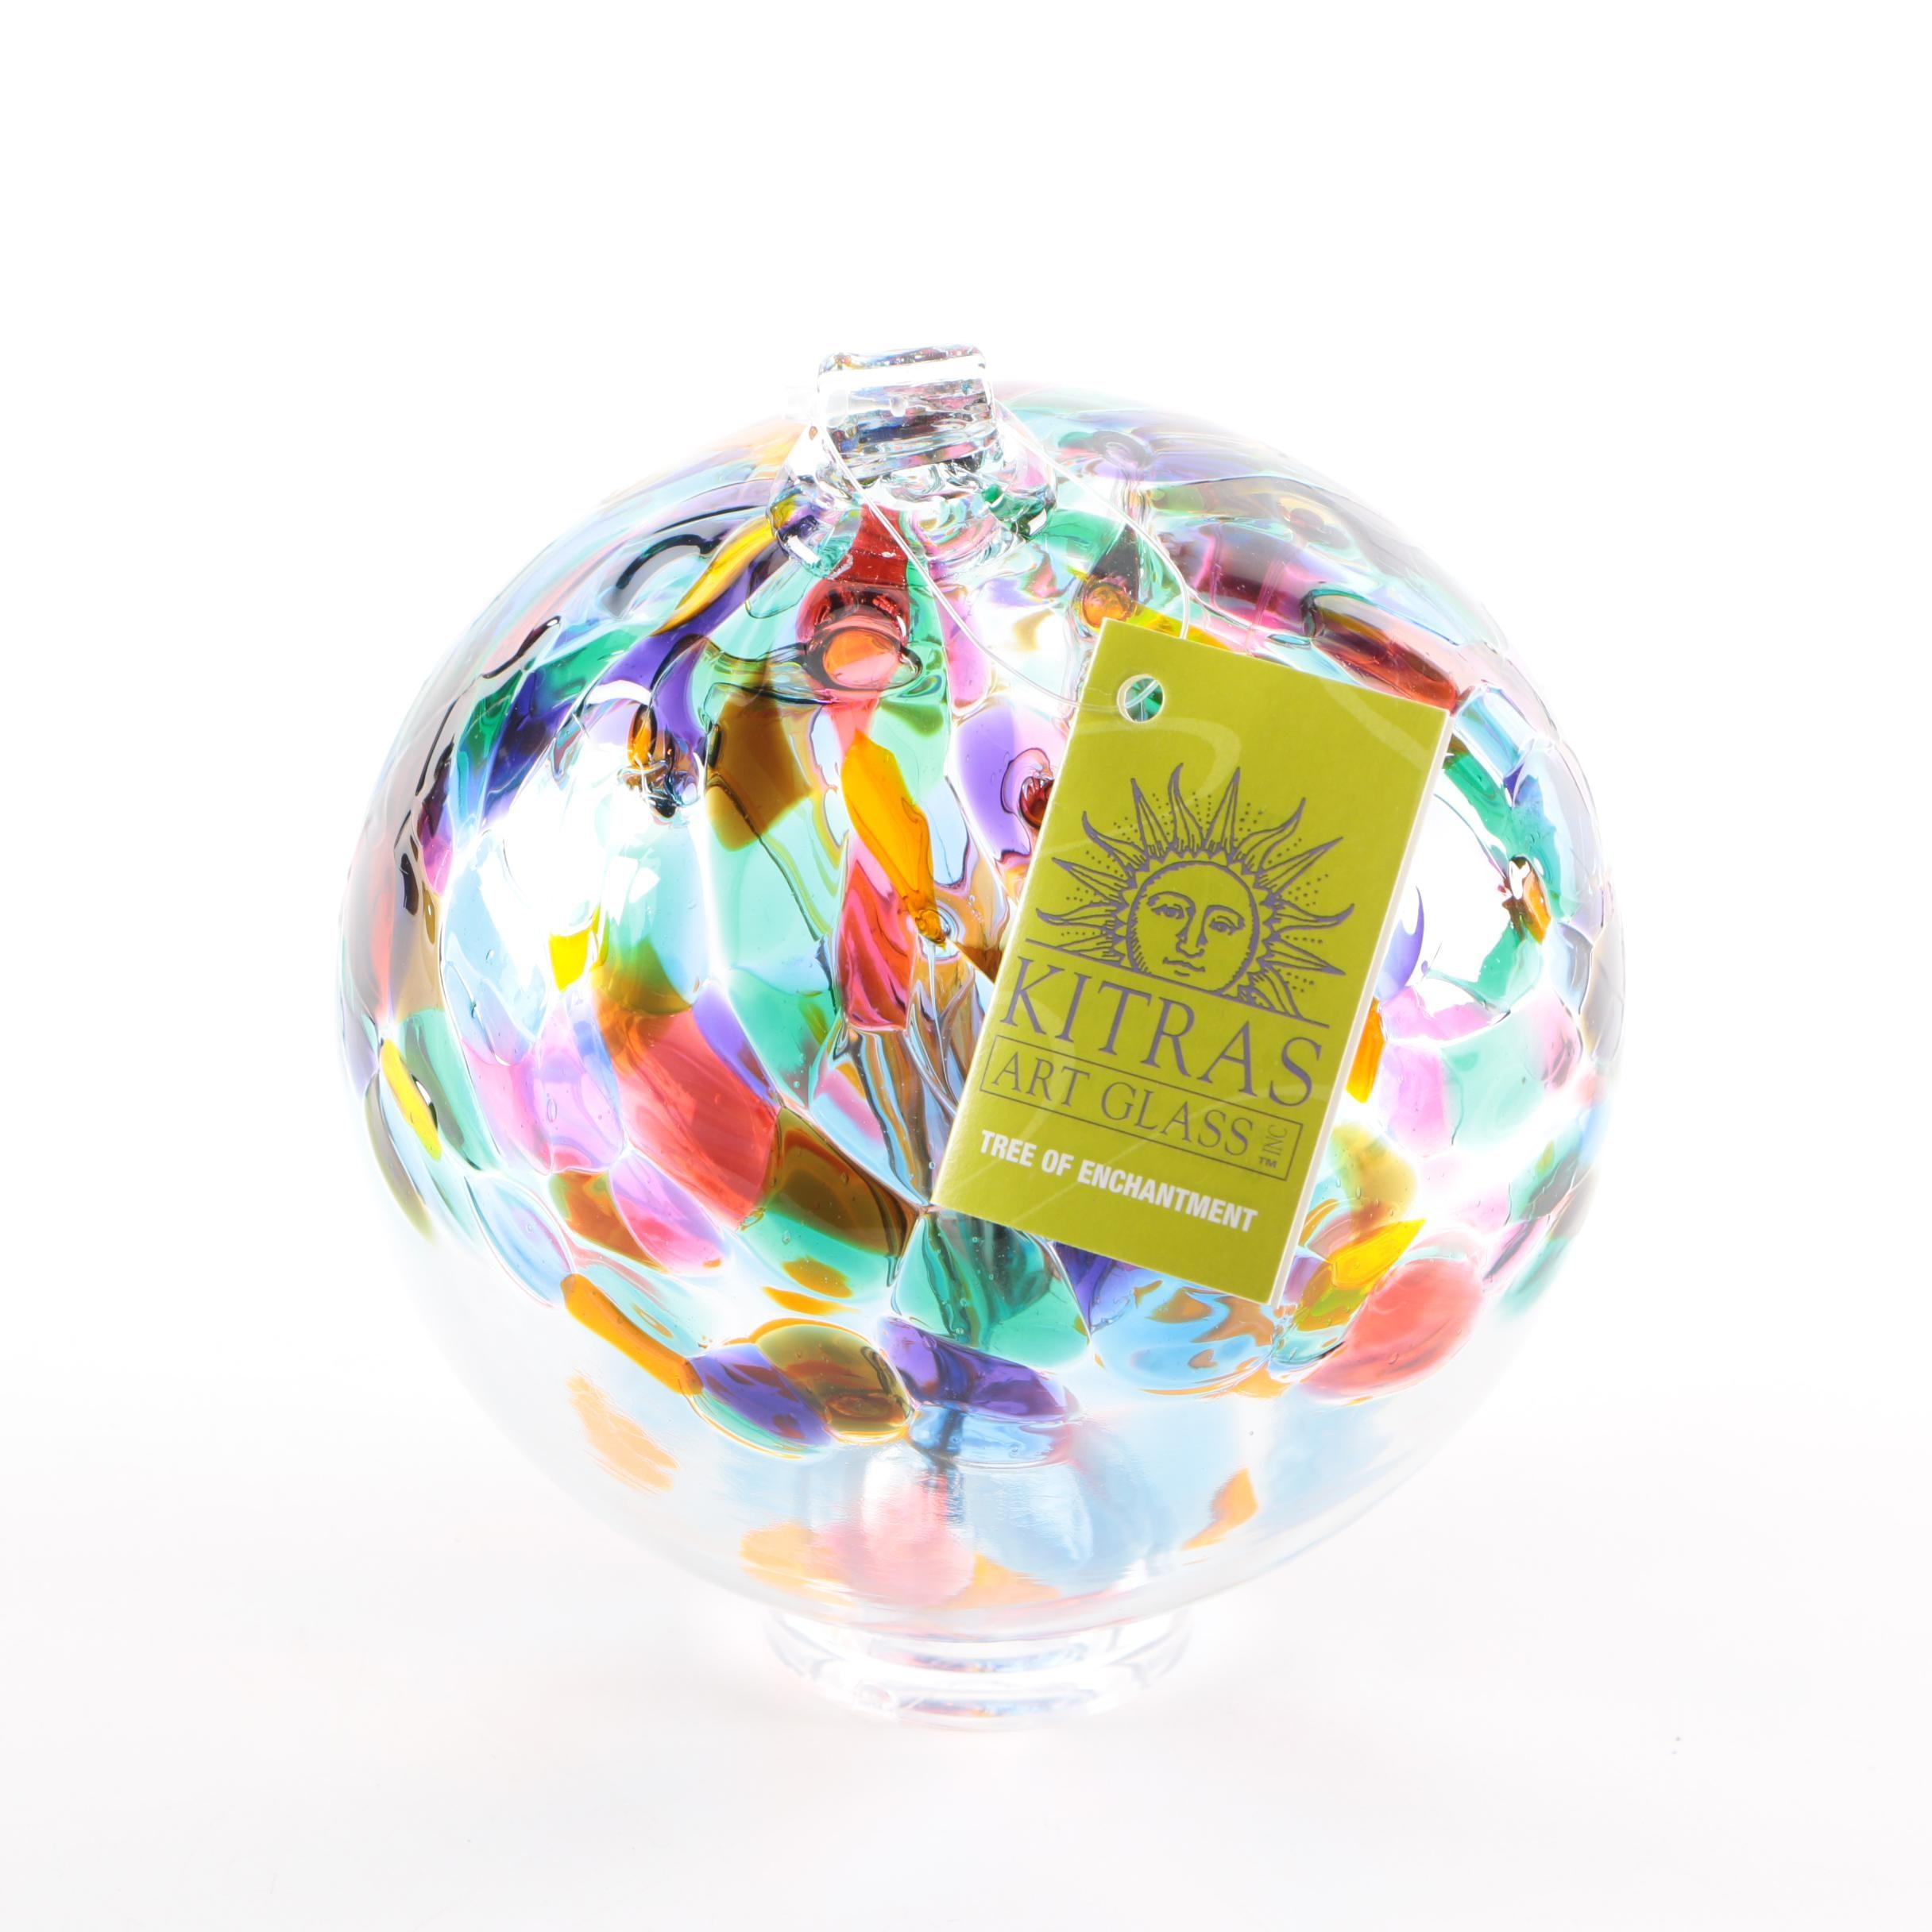 "Stephen Kitras ""Tree of Friendship"" Art Glass Bauble"